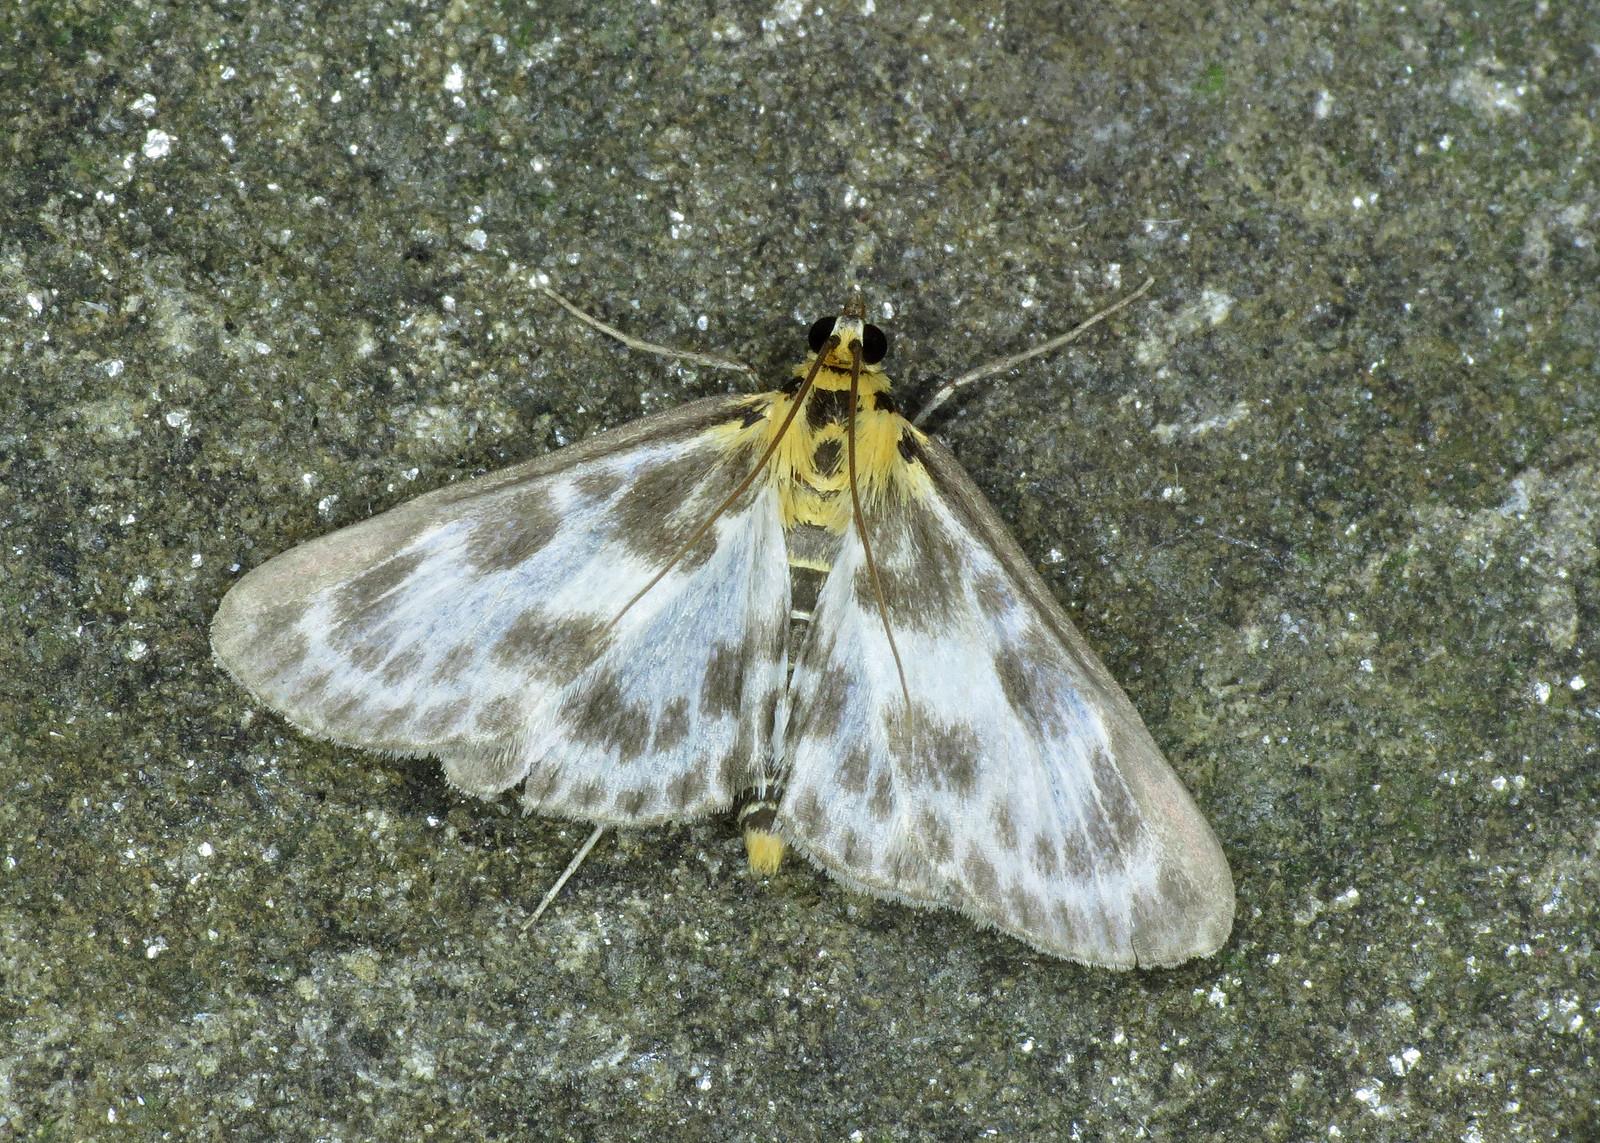 1376 Small Magpie - Eurrhypara hortulata